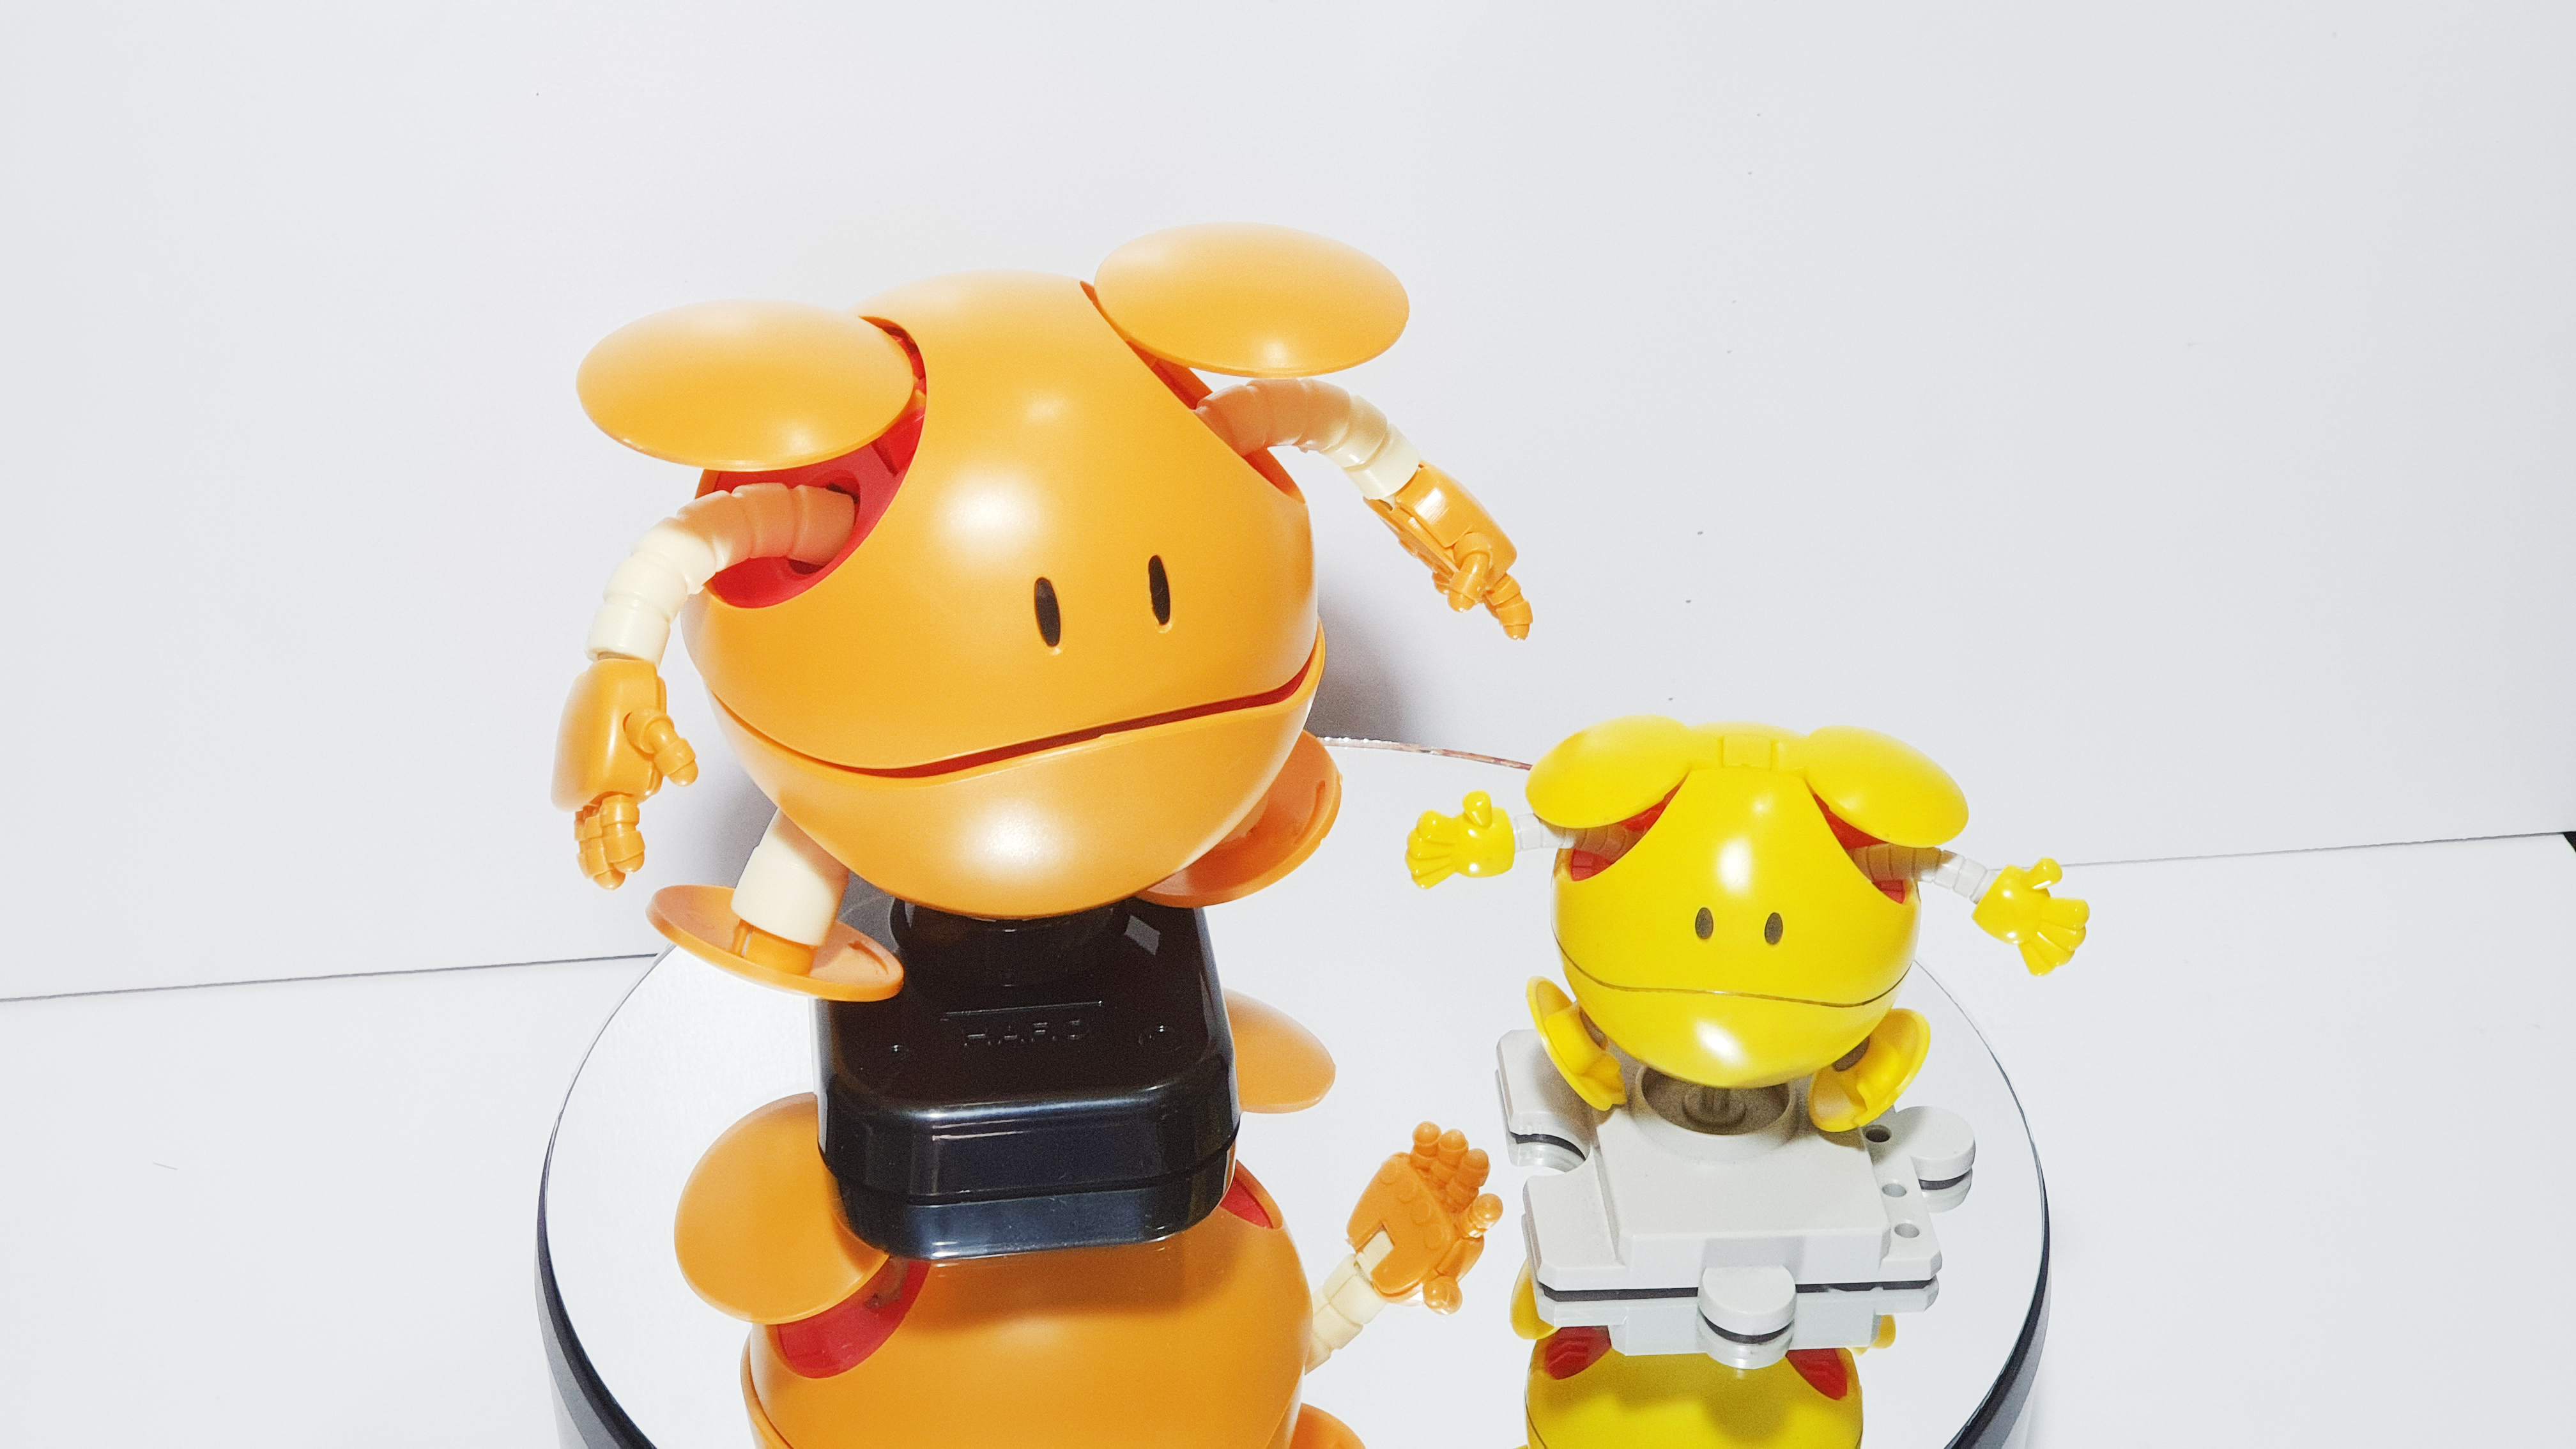 Comparison between Haro Mechanical Mascot and Haro Happy Yellow